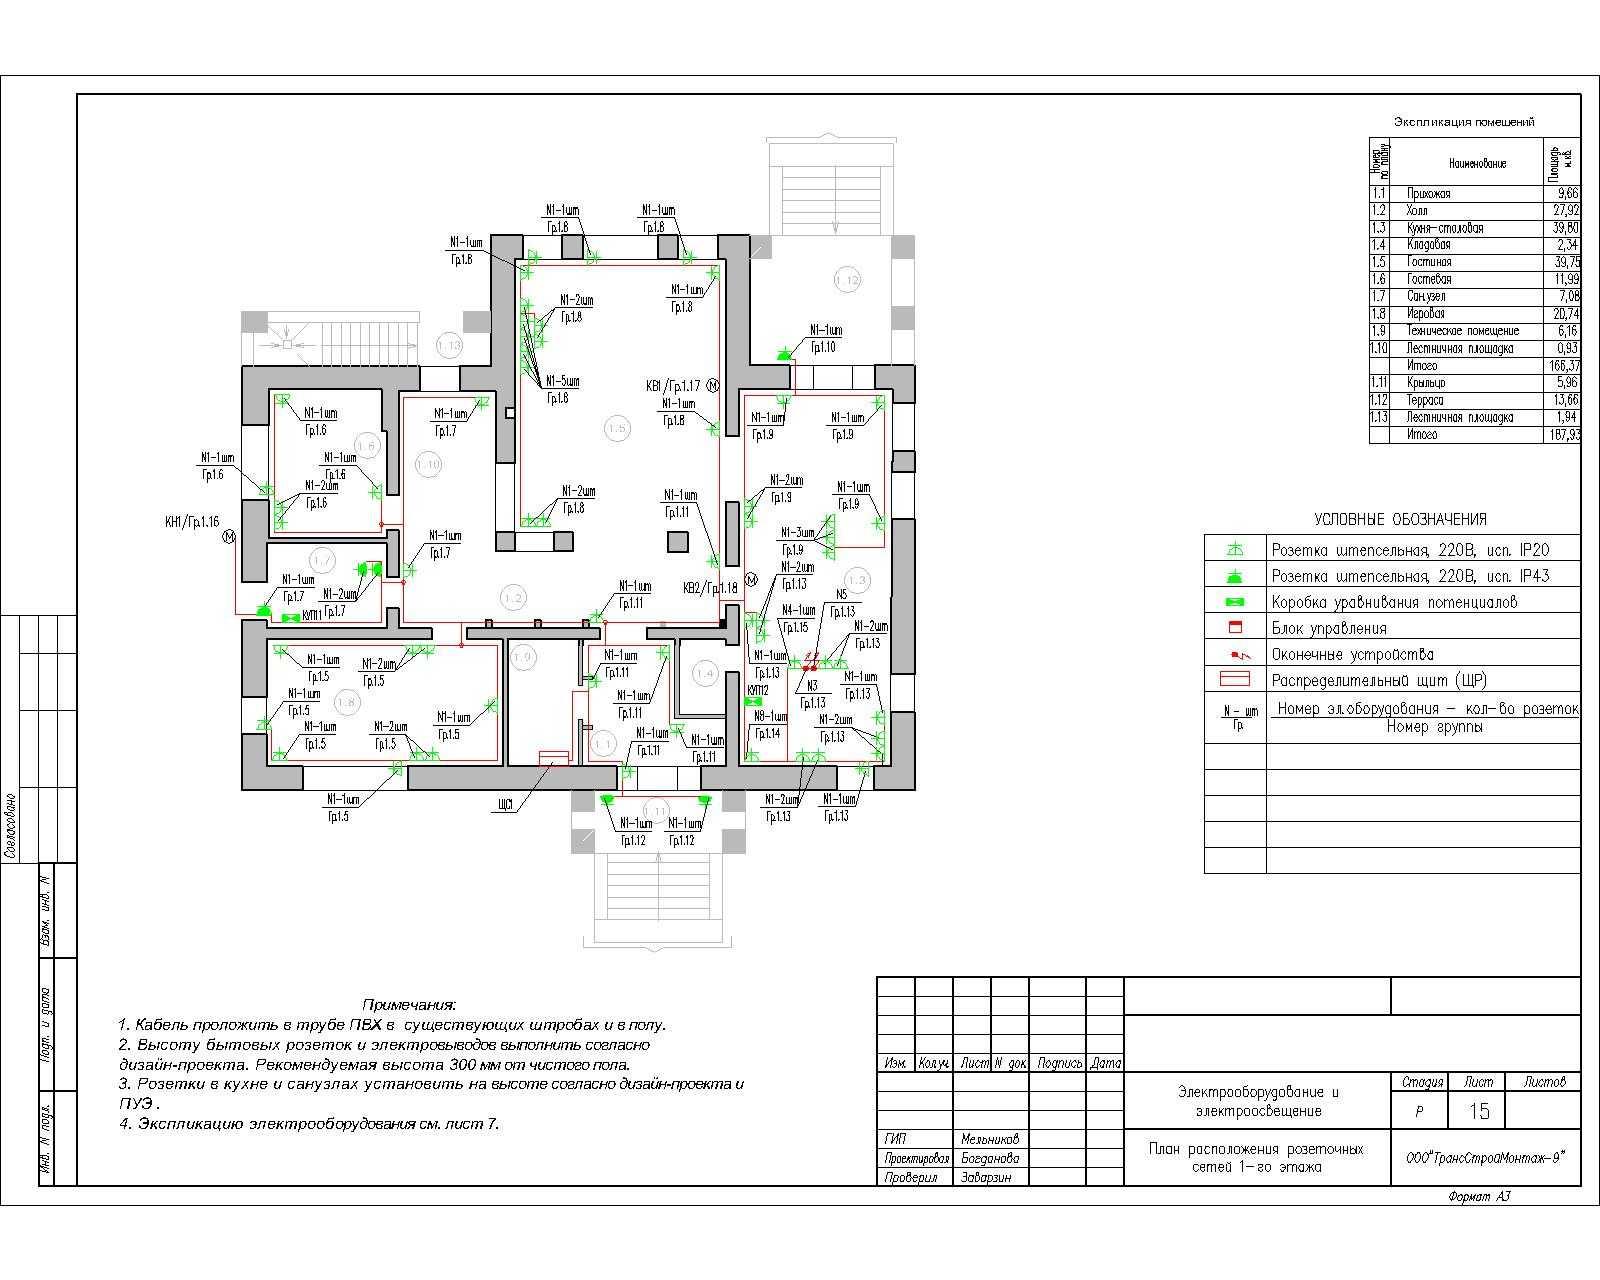 Электромонтаж в Тюмени, электромонтаж работа, электромонтаж домов, электромонтаж +в тюмени, услуги электромонтажа...